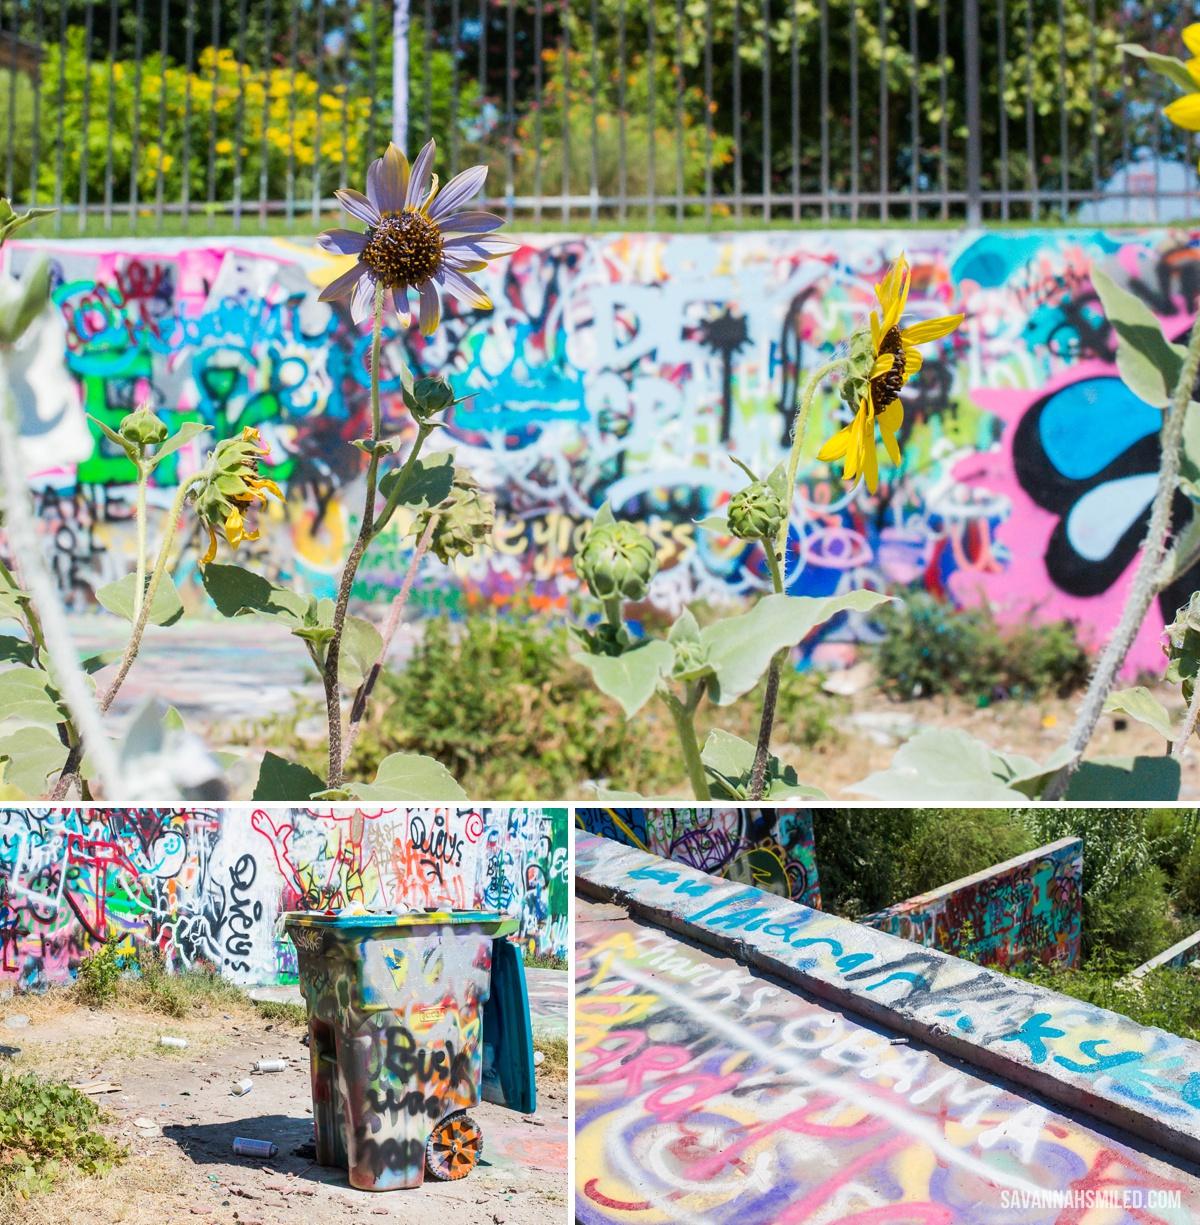 austin-graffiti-hope-outdoor-gallery-16.jpg